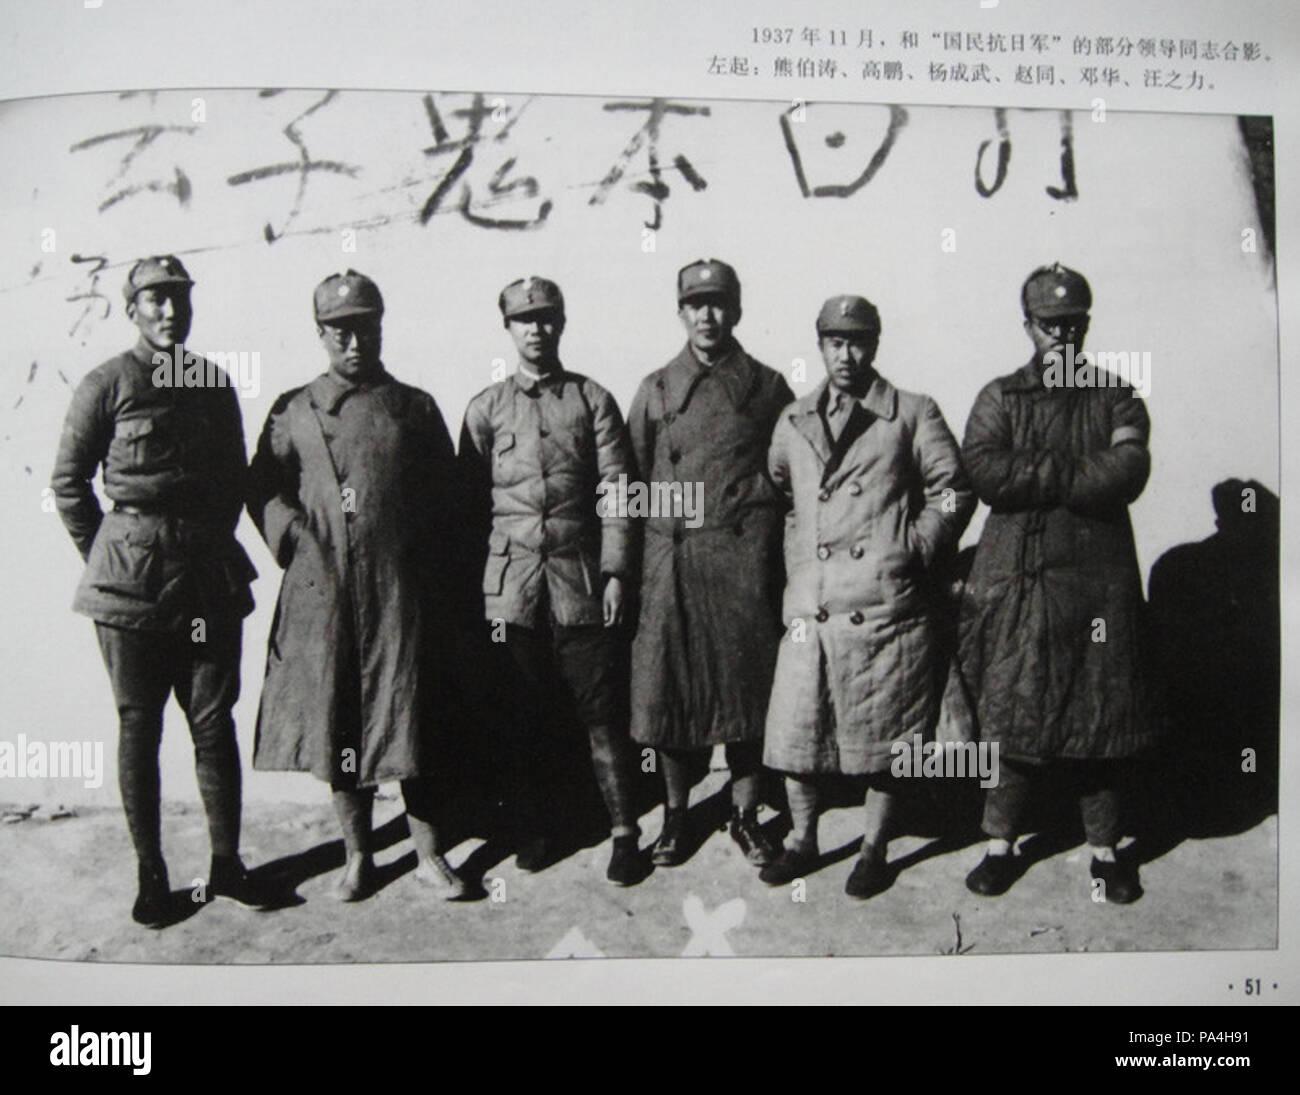 Anti Japanese Imágenes De Stock & Anti Japanese Fotos De Stock - Alamy